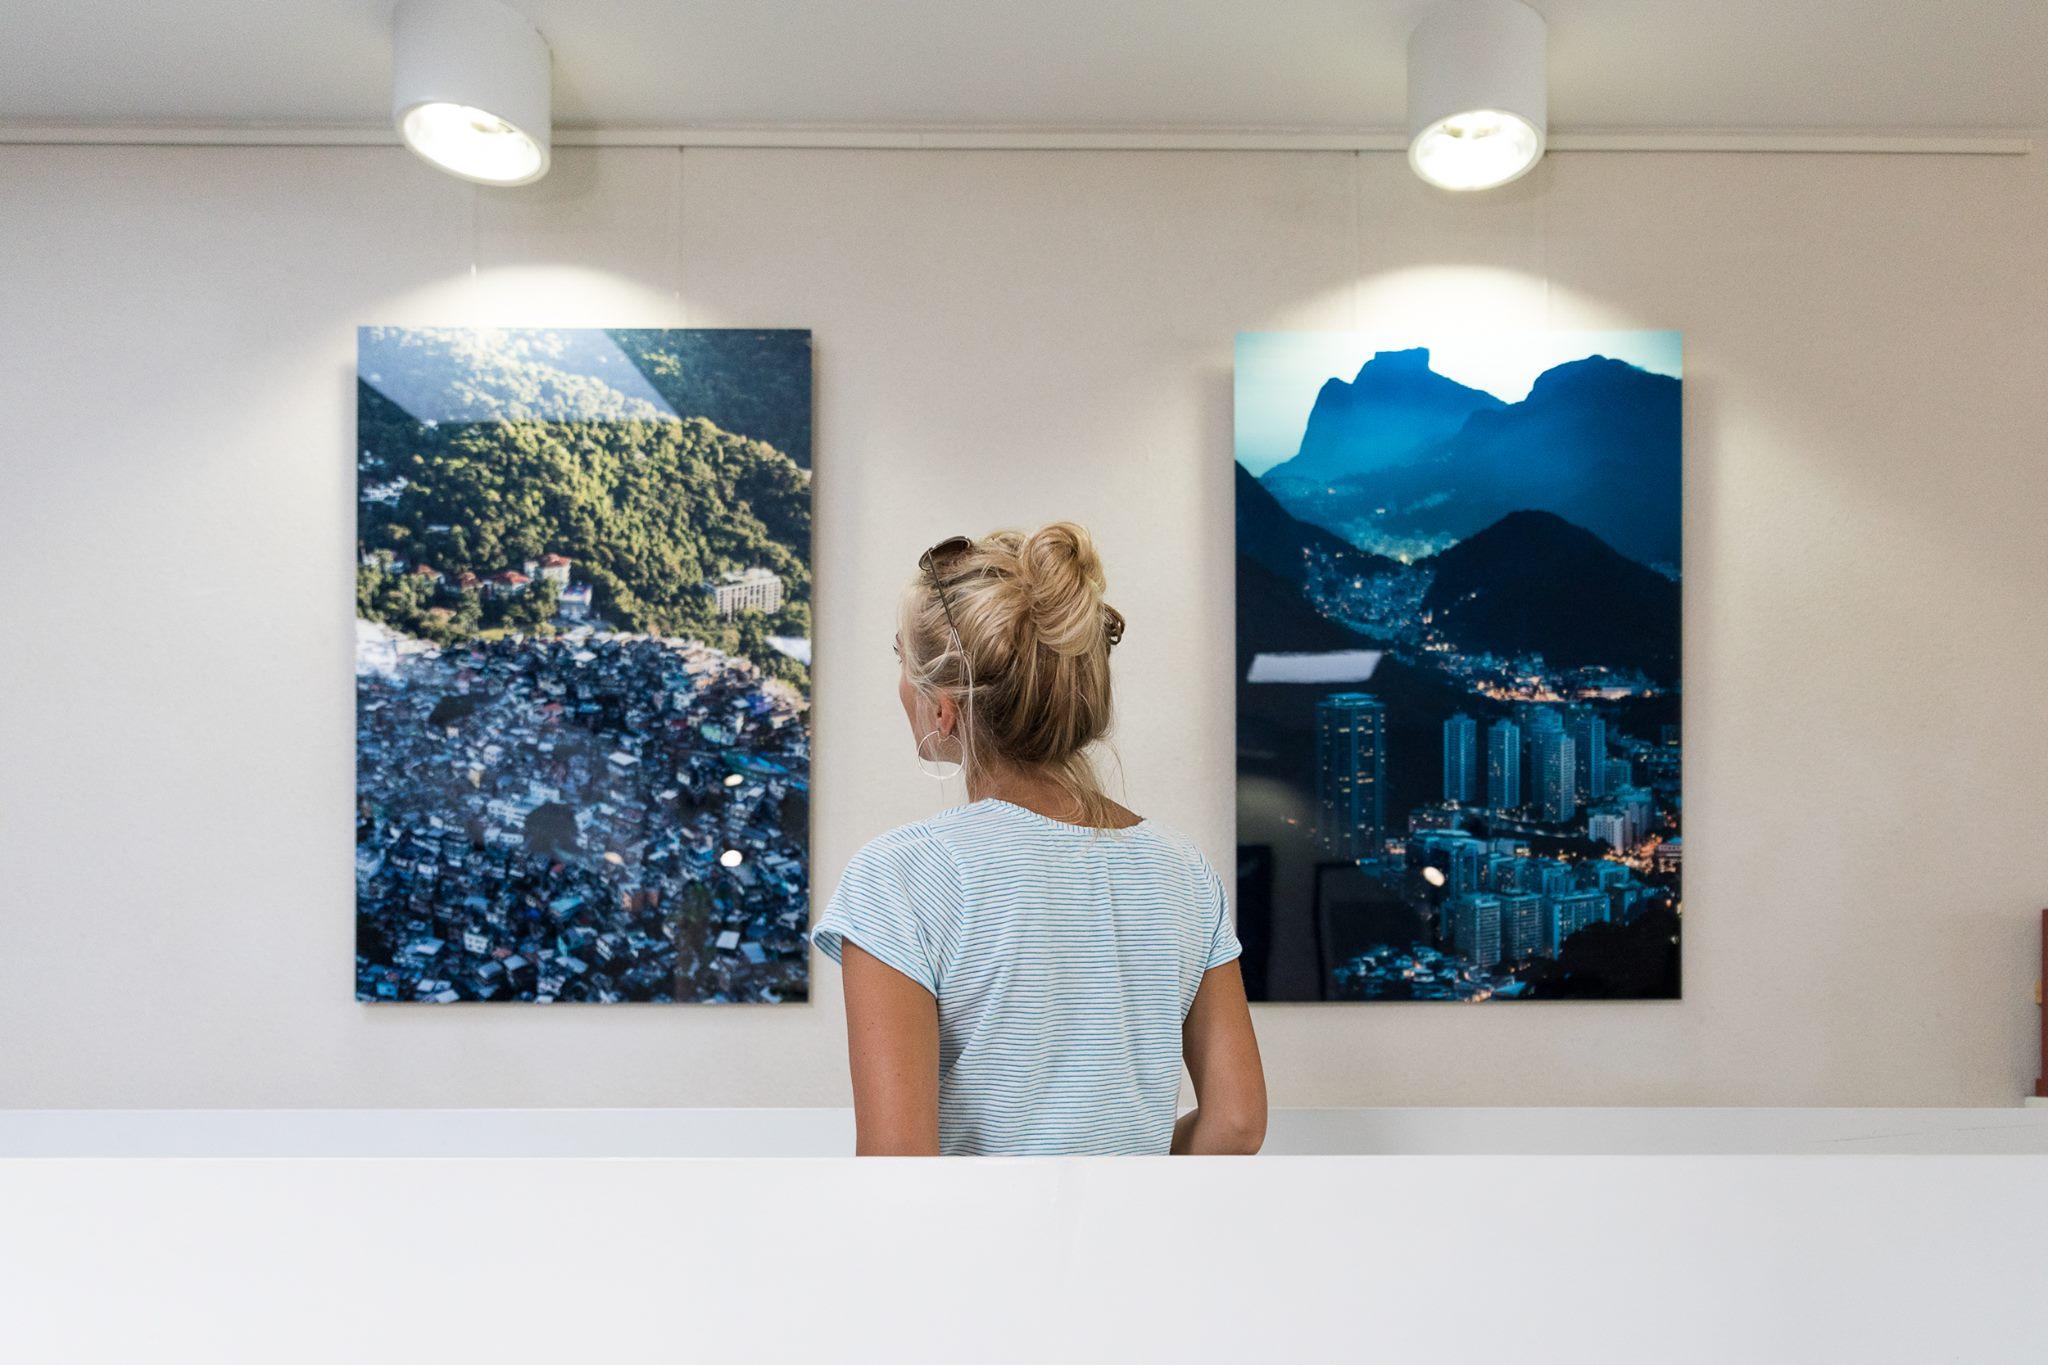 exhibition expo Cuperus Antwerpen fotografie kunst Frederick Van Grootel Charlotte Van Looy